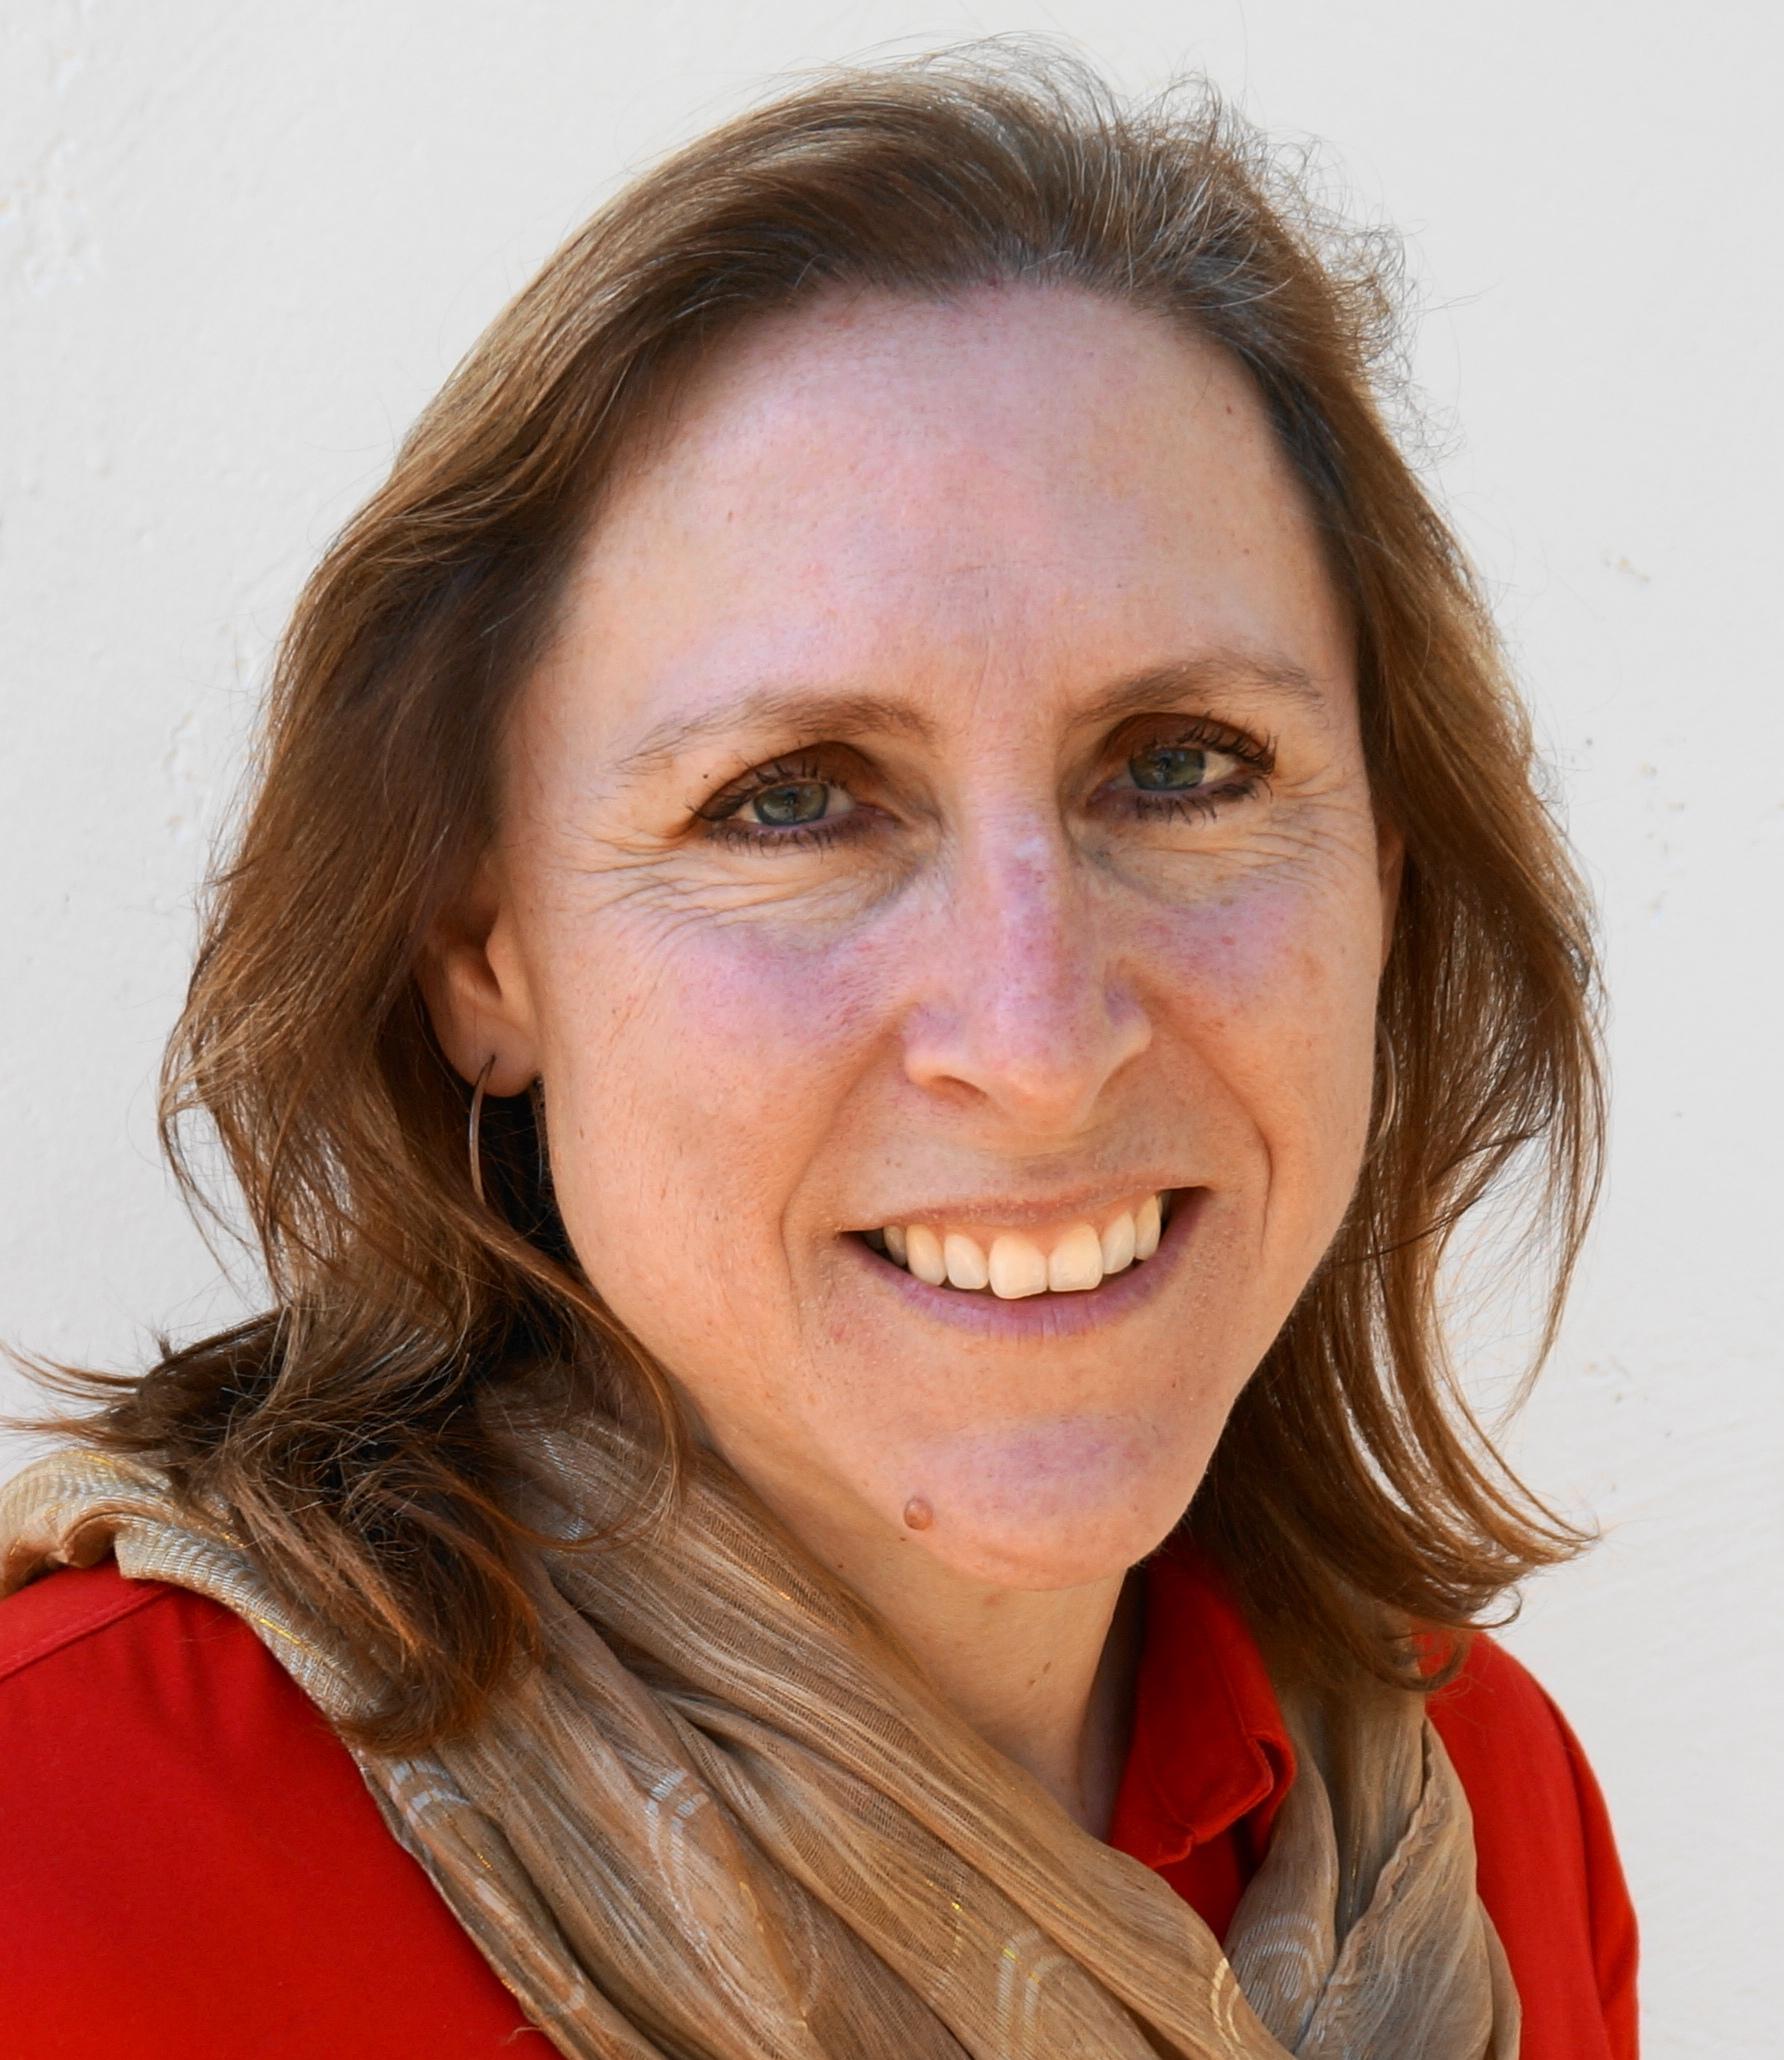 Farmers Insurance - Laurie Hance